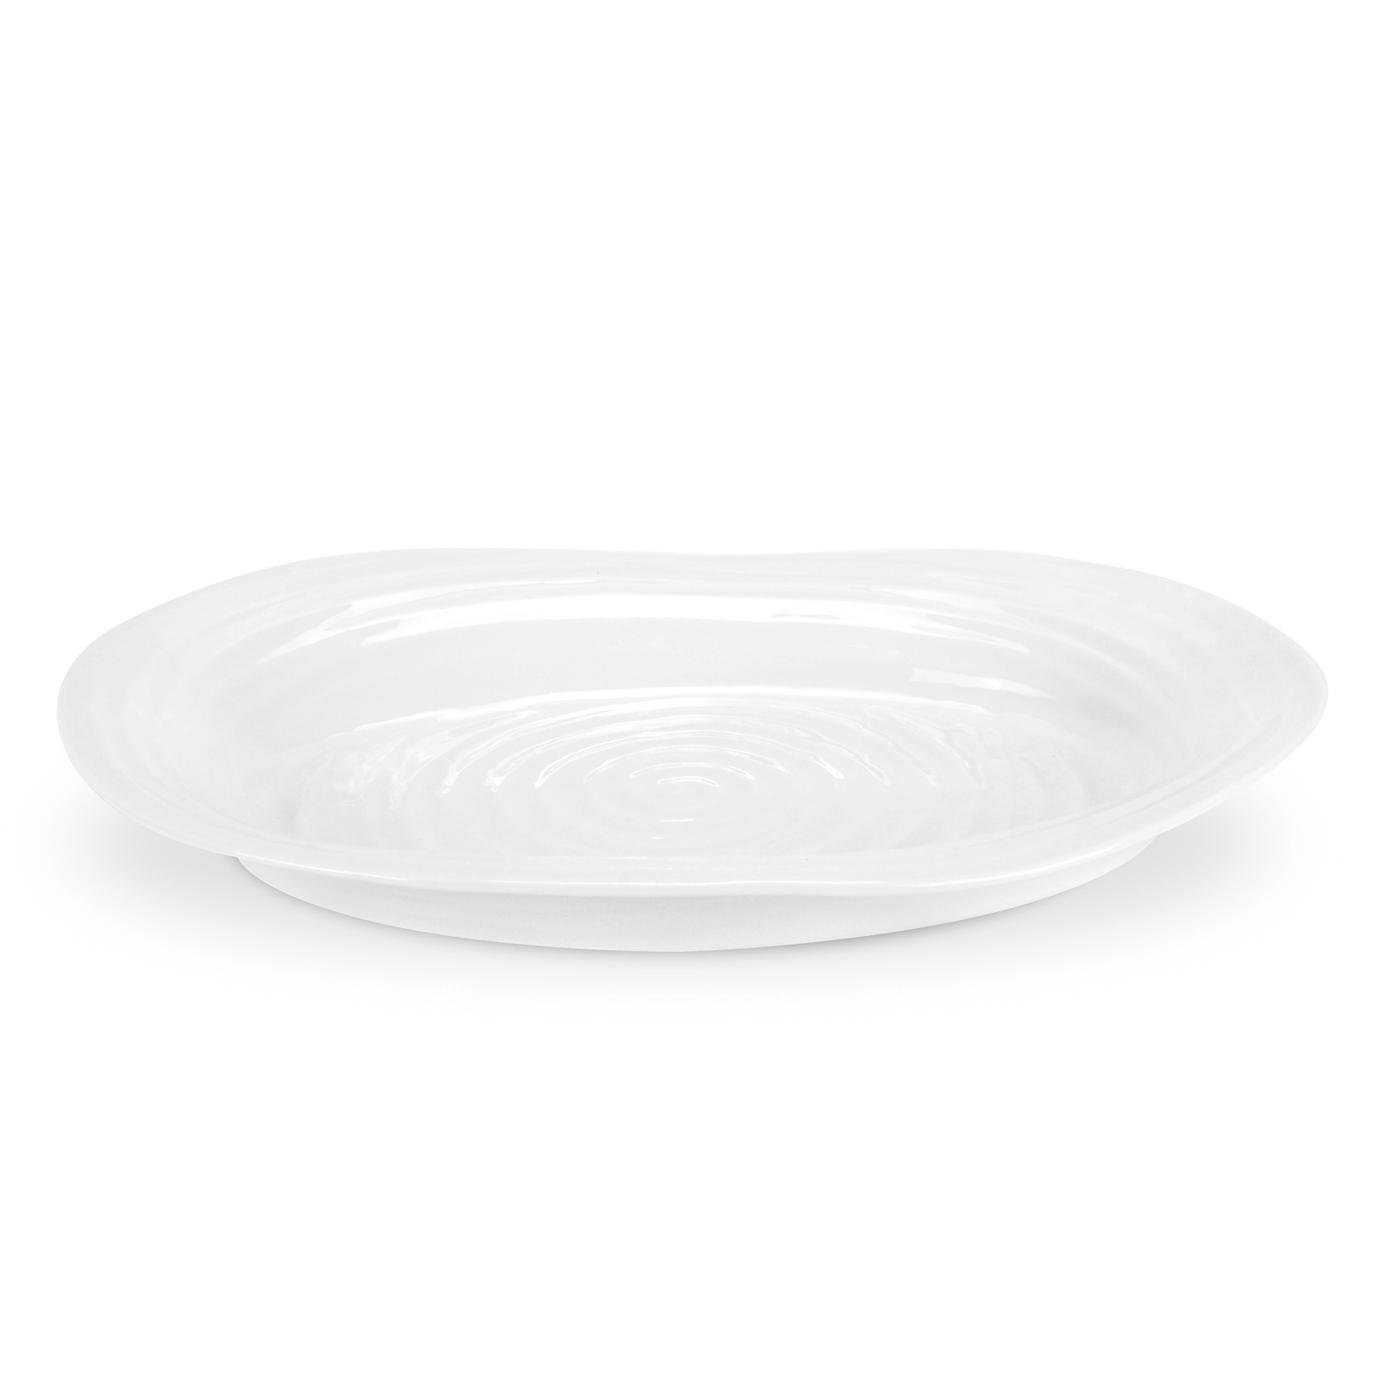 Portmeirion Sophie Conran White Medium Oval Platter 434356